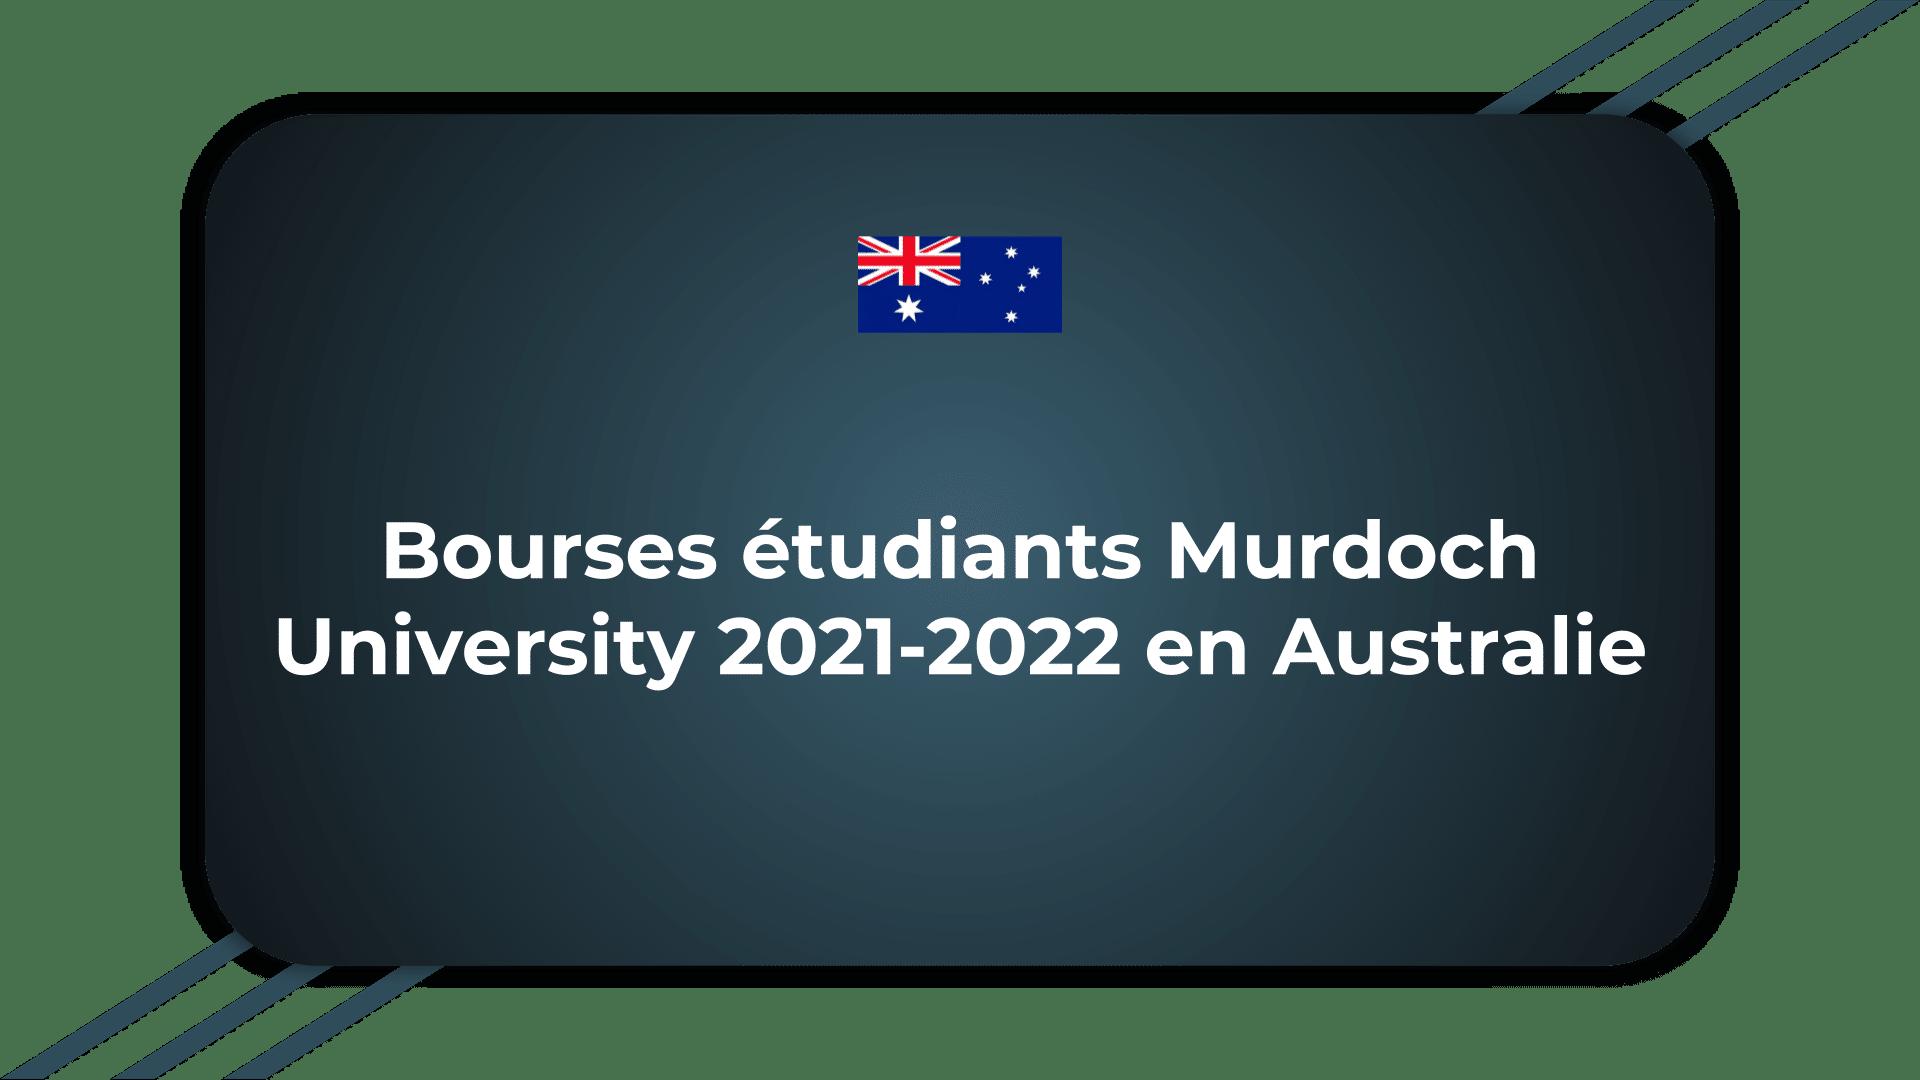 Bourses étudiants Murdoch University